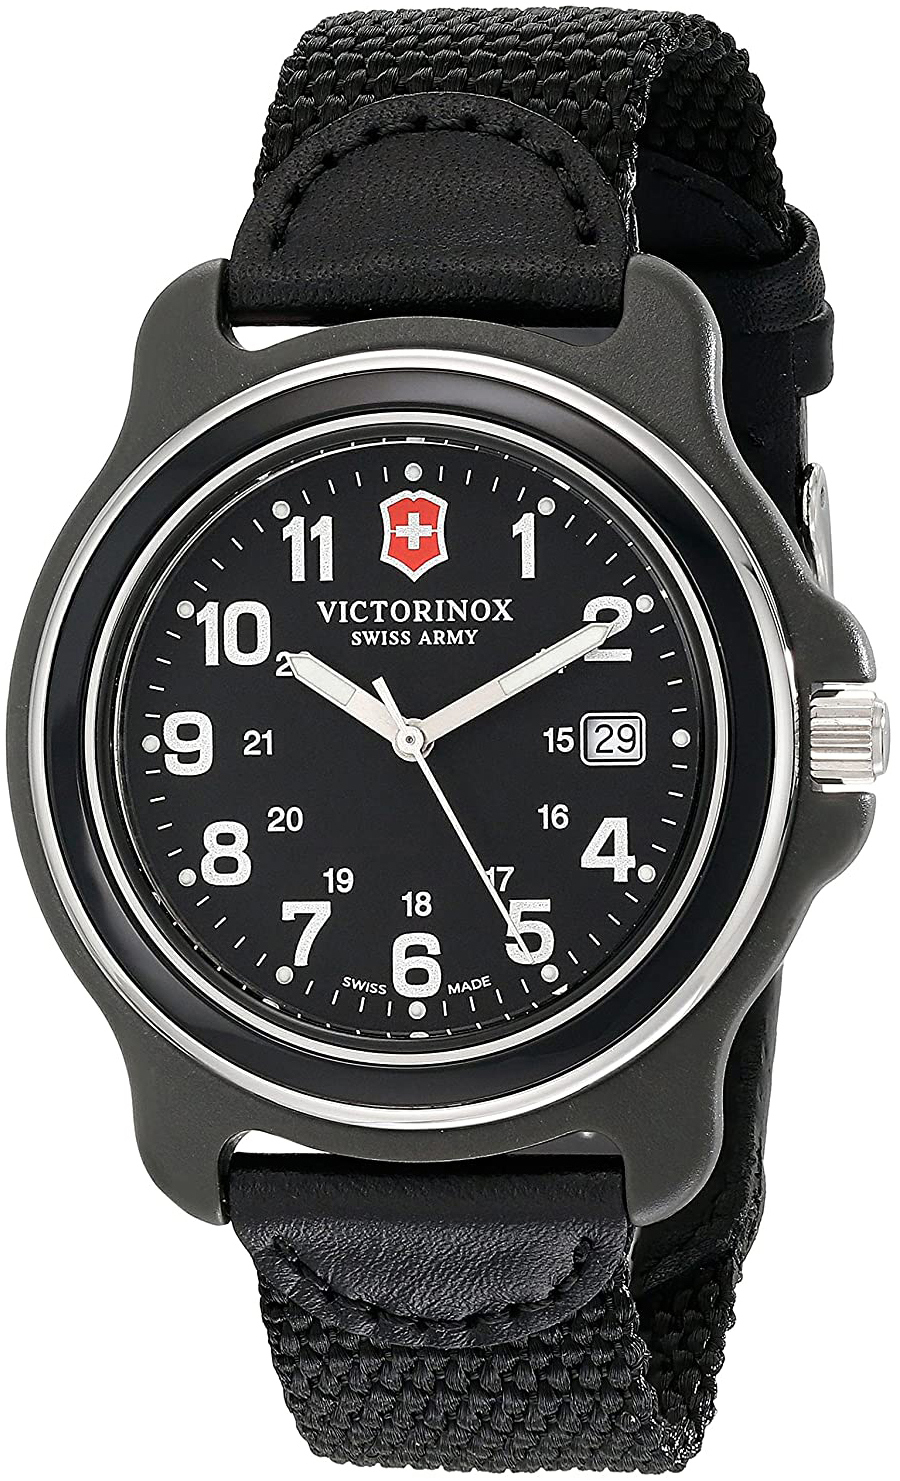 Victorinox 99999 Herreklokke 249087 Sort/Tekstil Ø43 mm - Victorinox